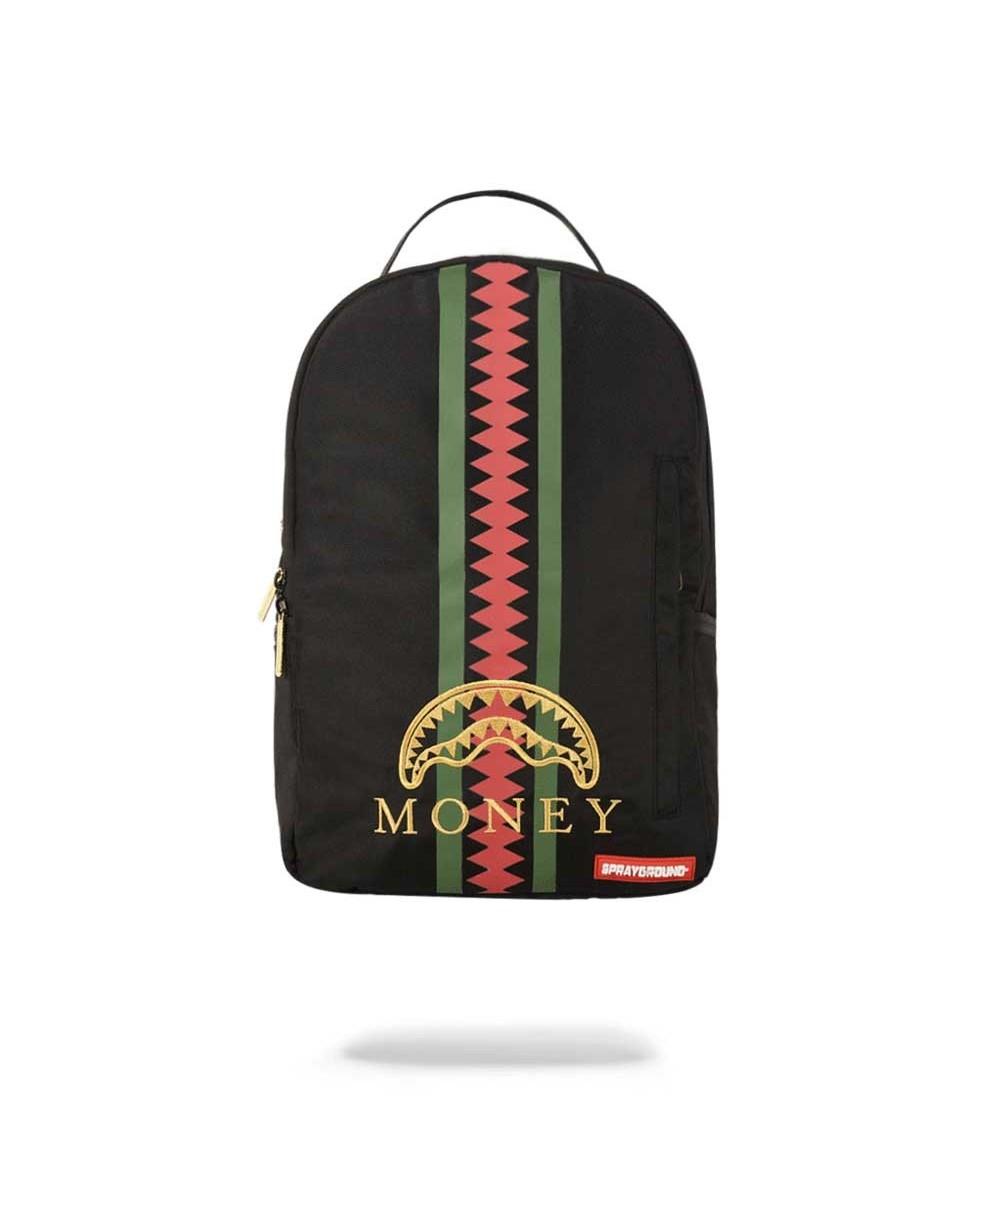 1a2415e7d Sprayground Florence Money Backpack